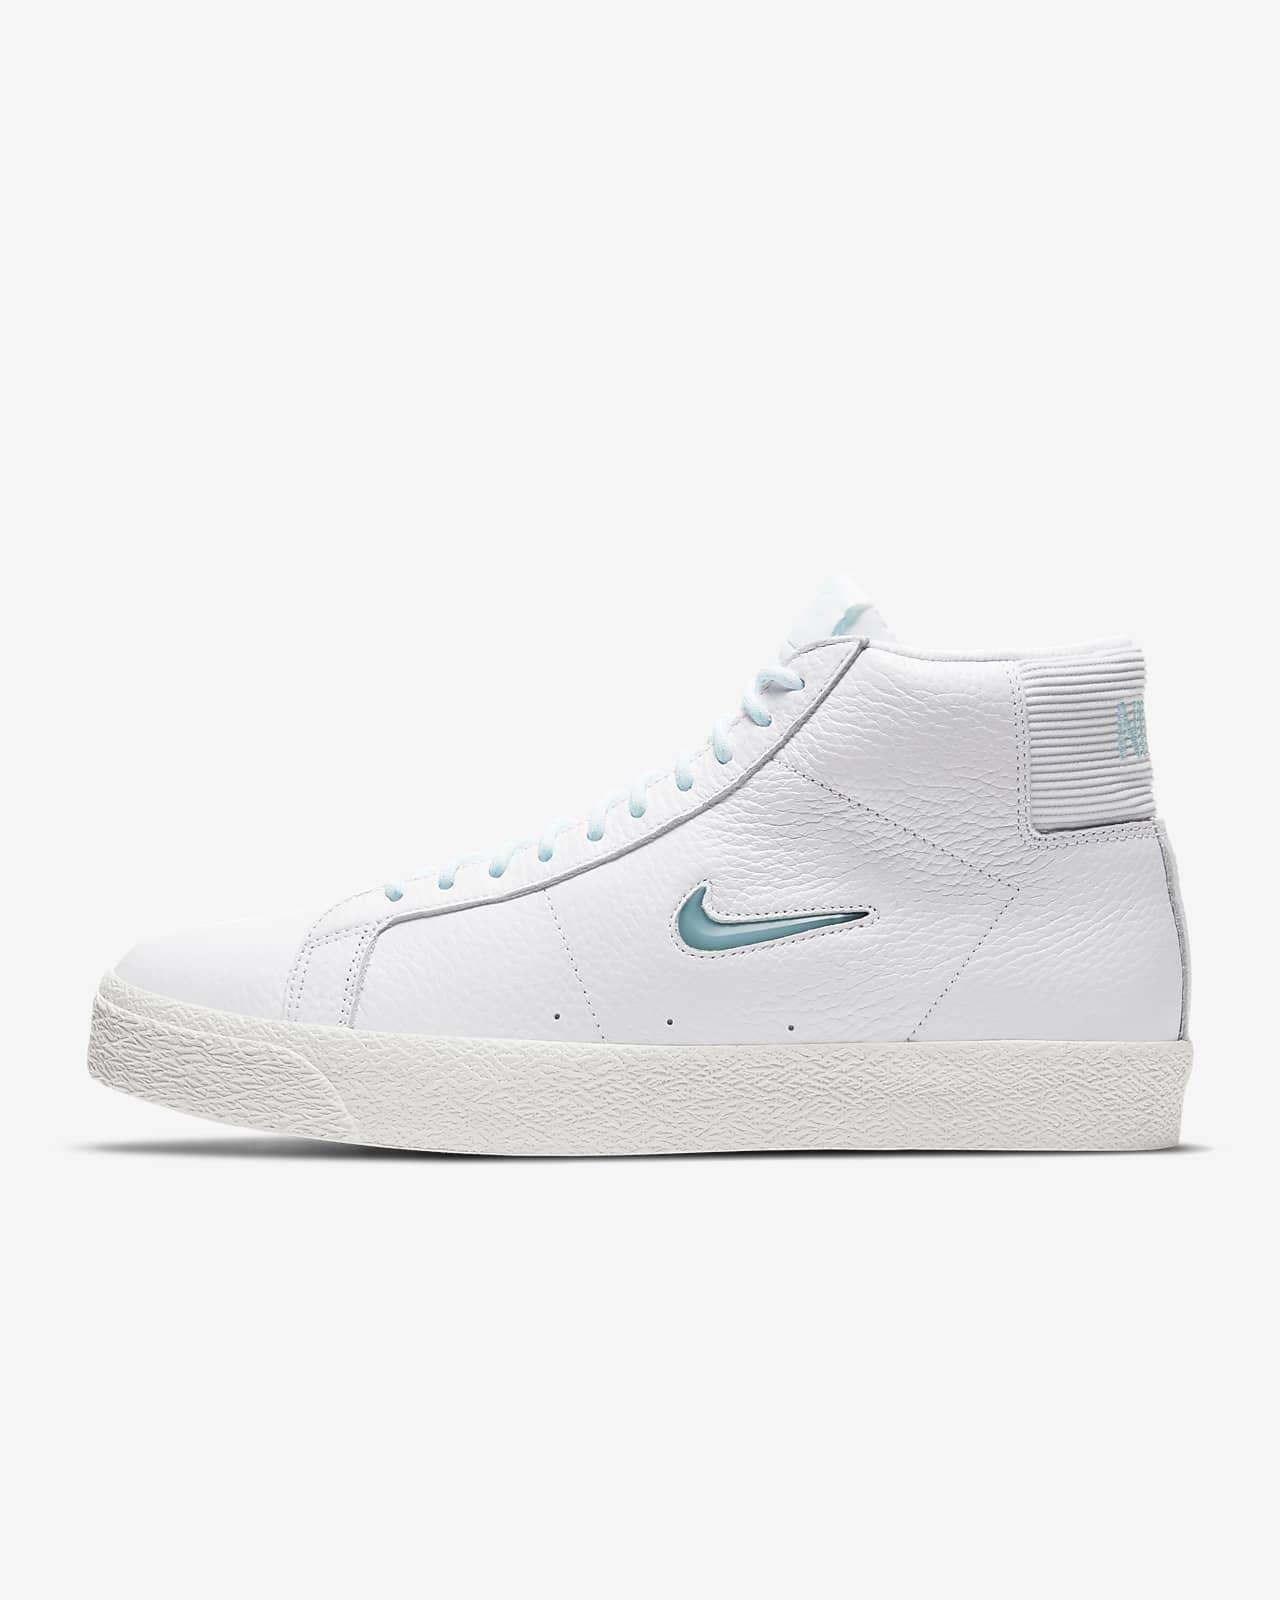 Chaussure de skateboard Nike SB Zoom Blazer Mid Premium